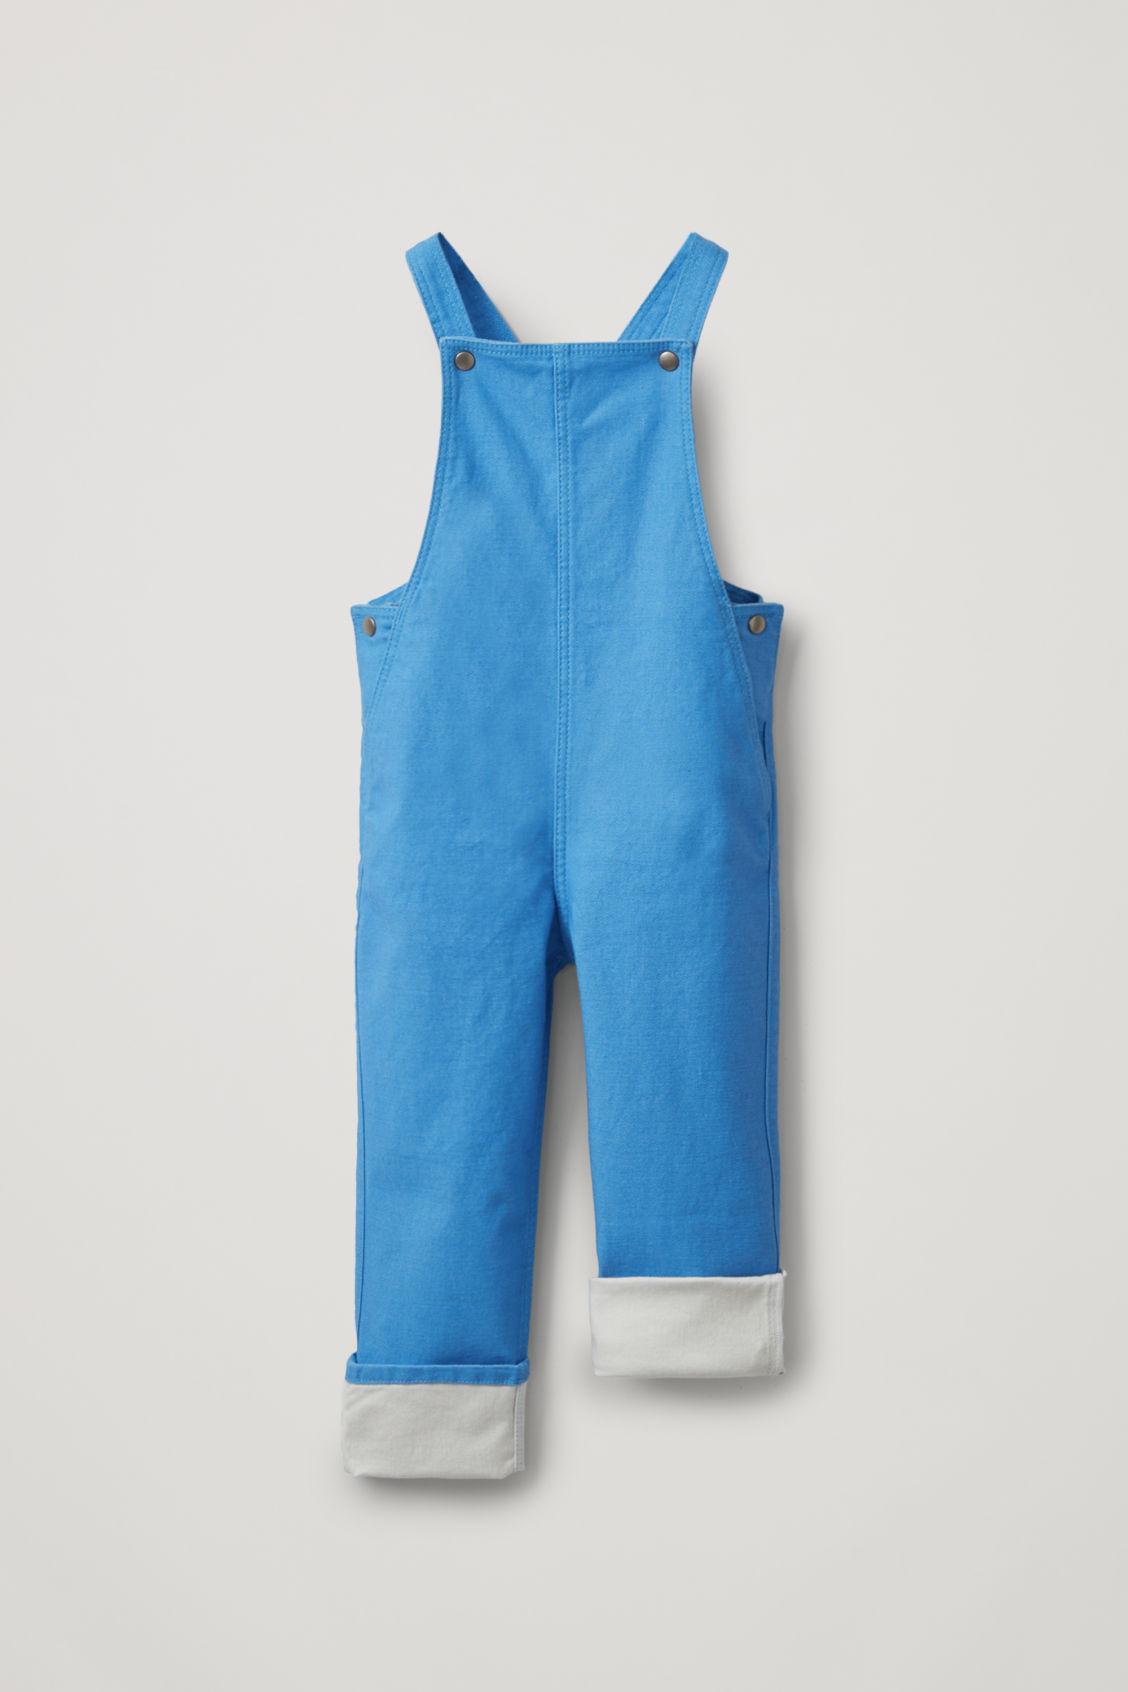 Cos Kids' Organic Cotton Denim Dungarees In Blue